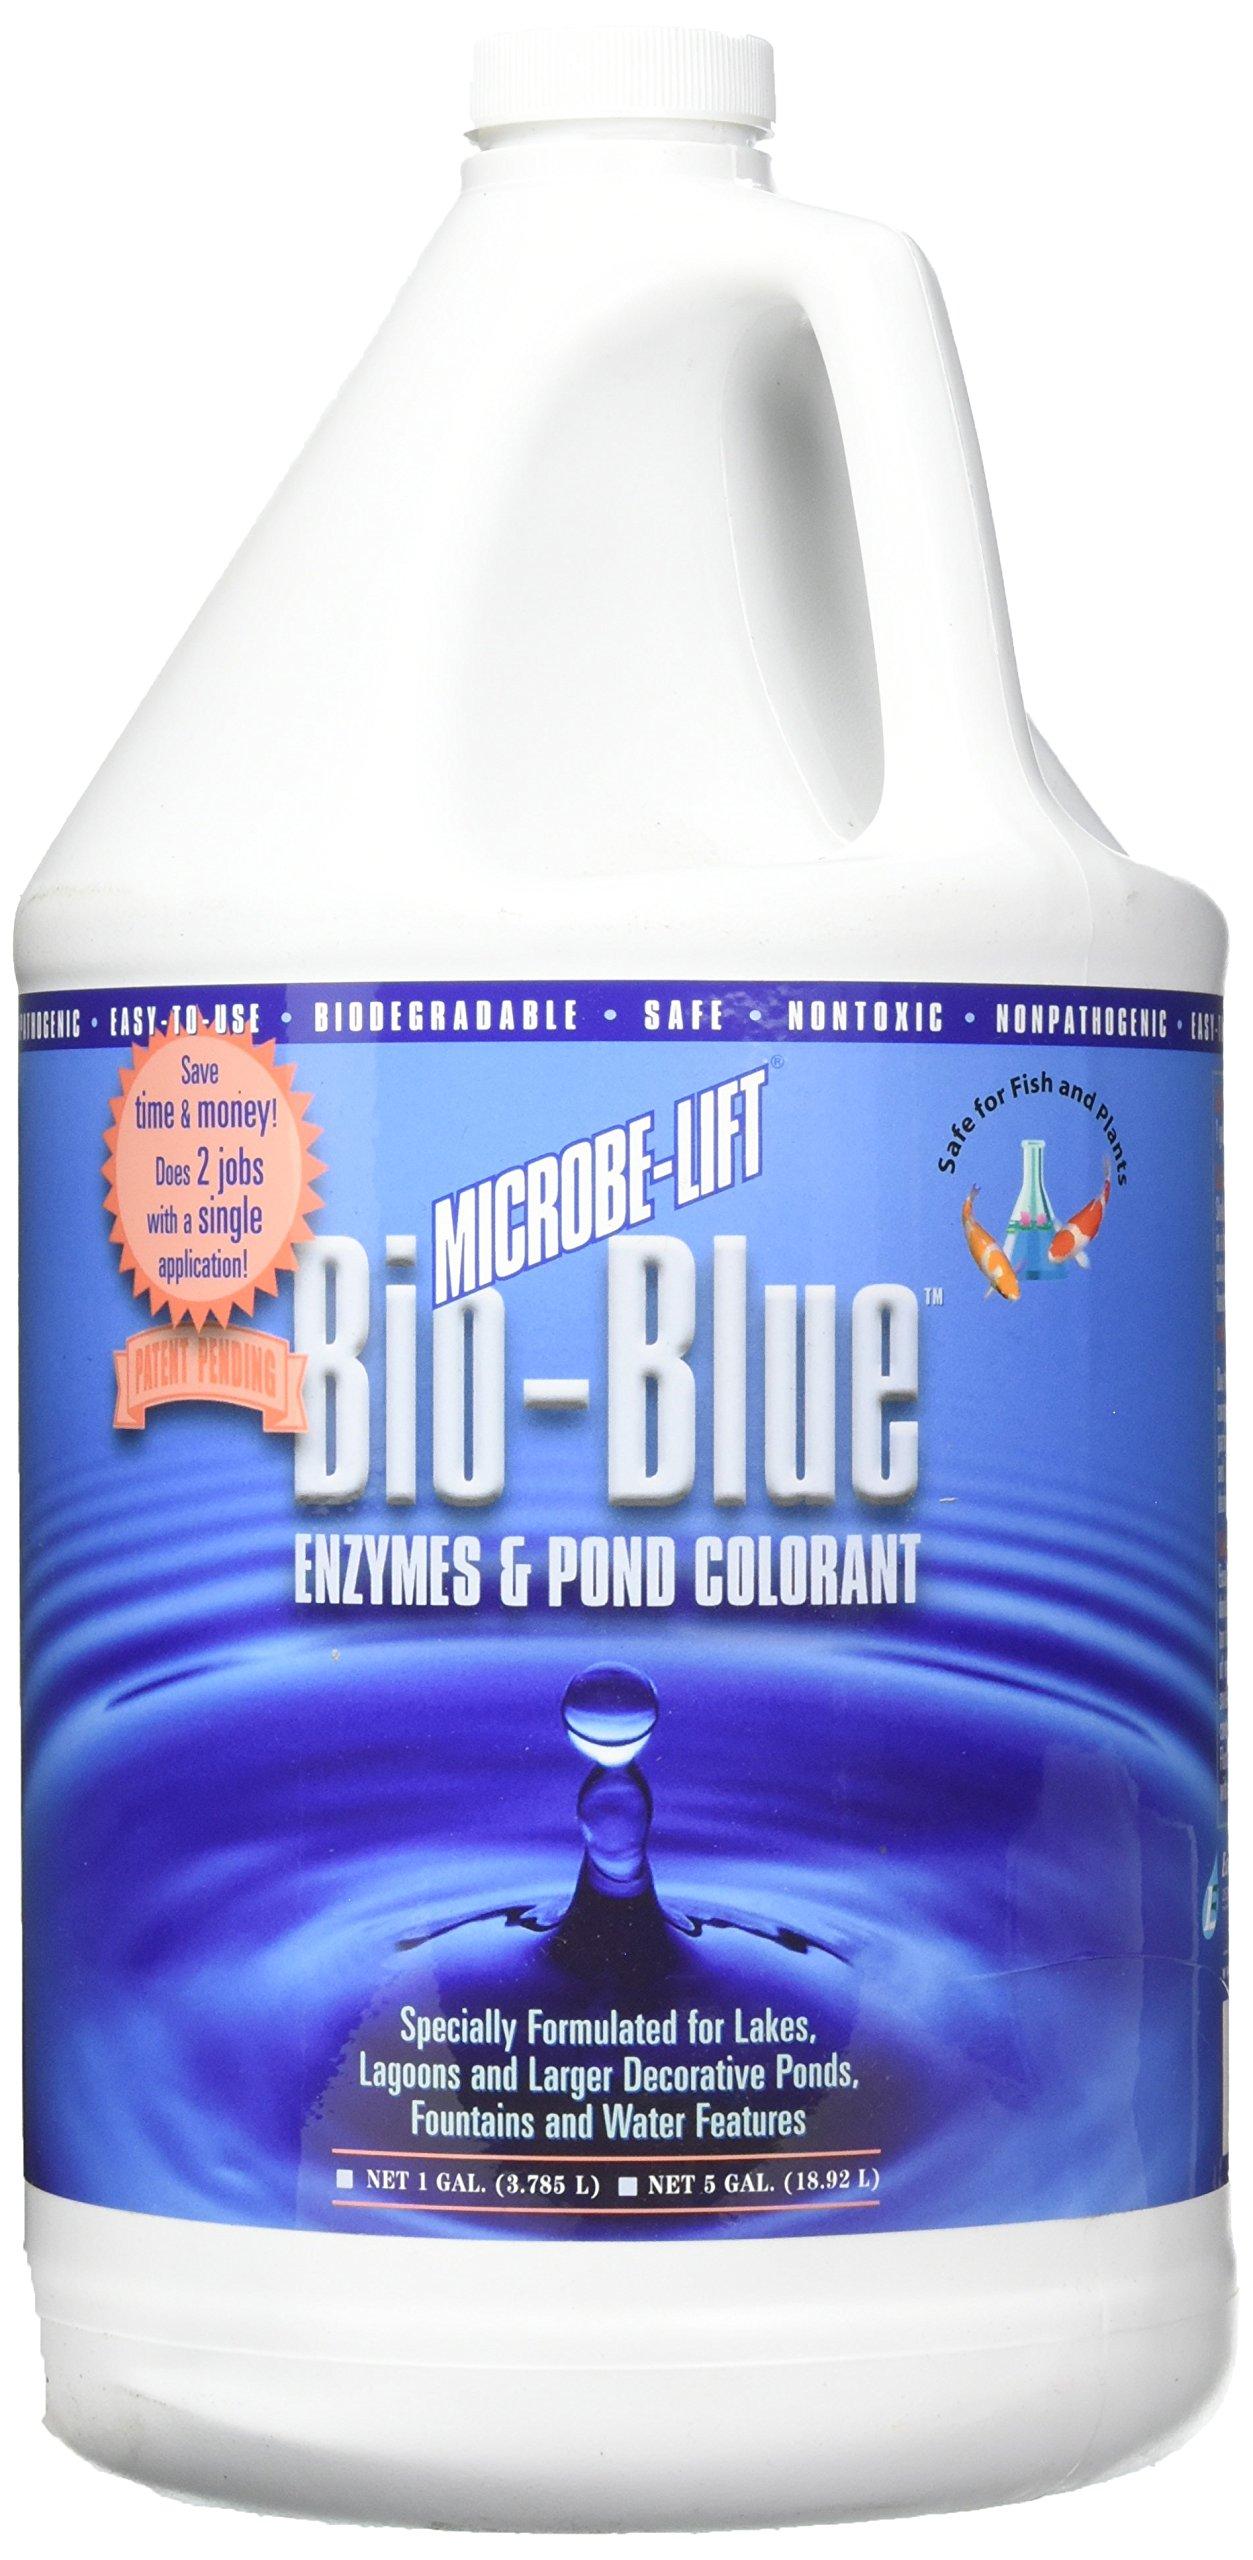 Ecological Labs MLBBG4 1-Gallon Microbe-Lift Bio-Blue